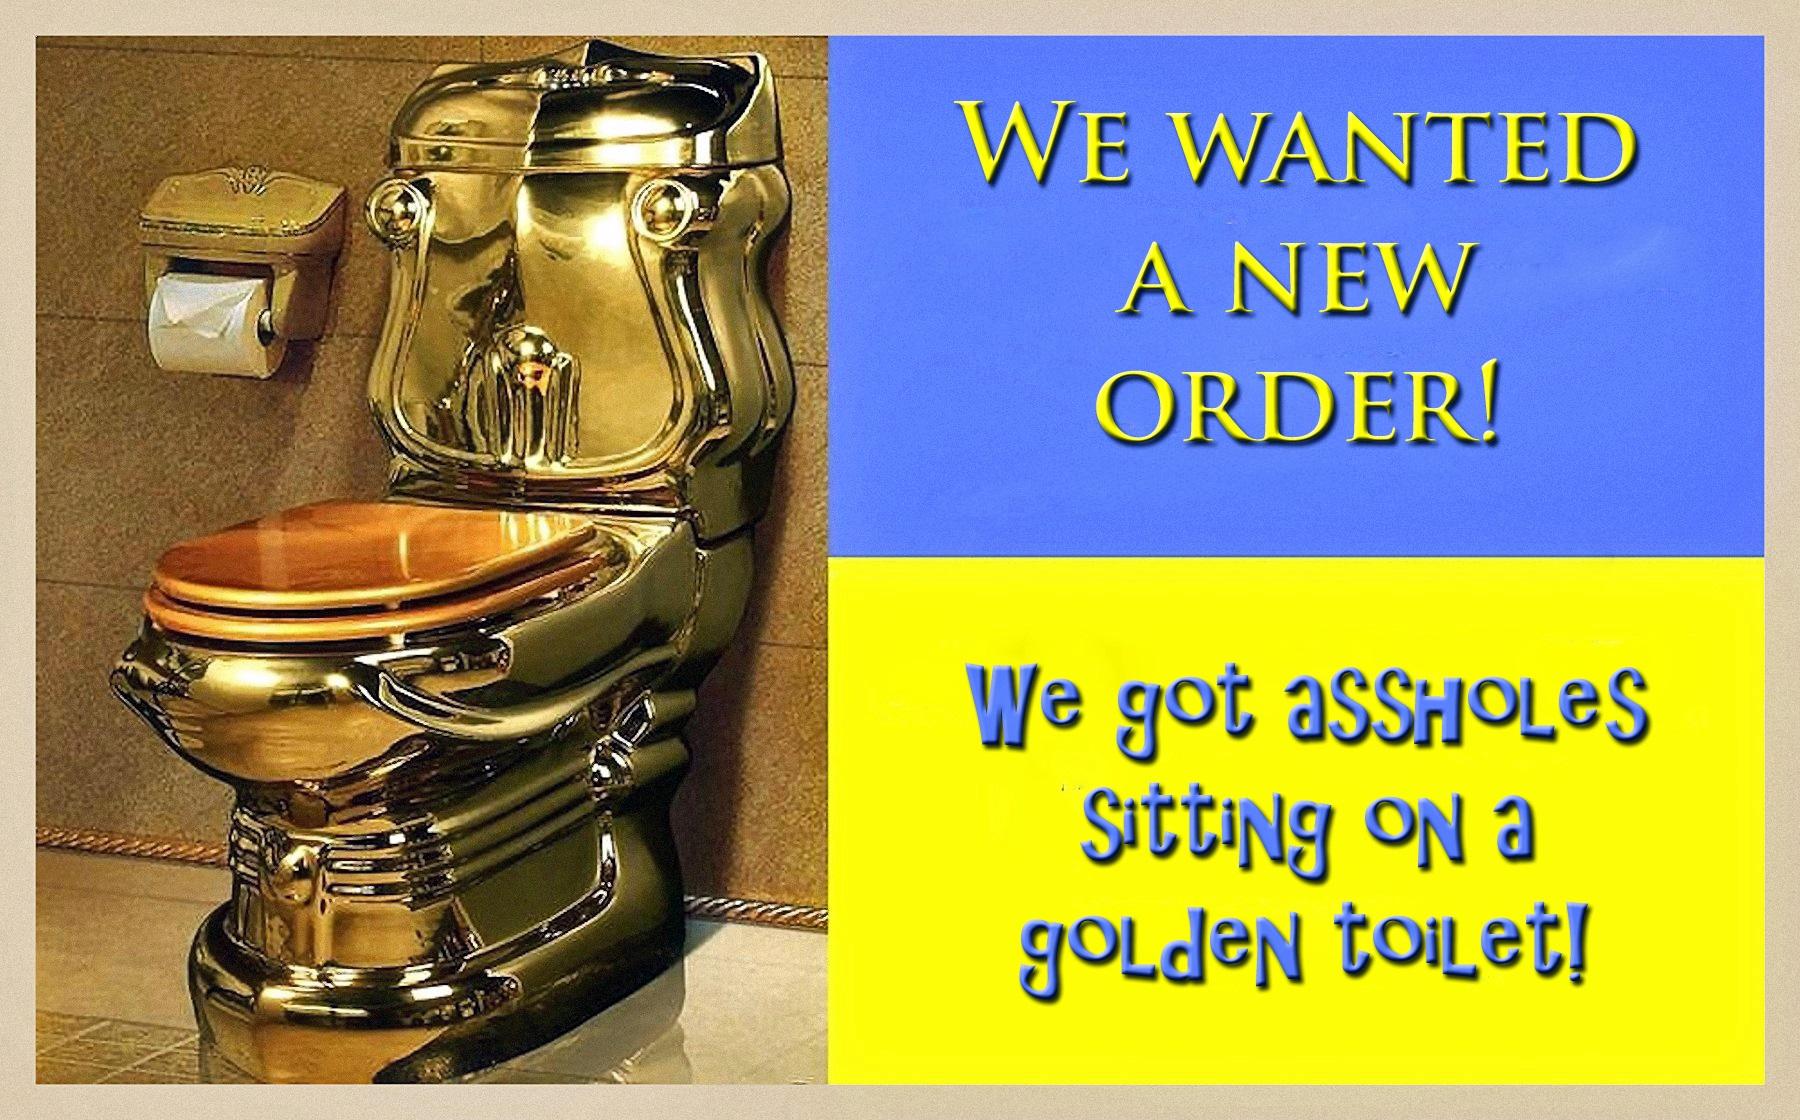 00 assholes on a golden toilet ukraine 301015